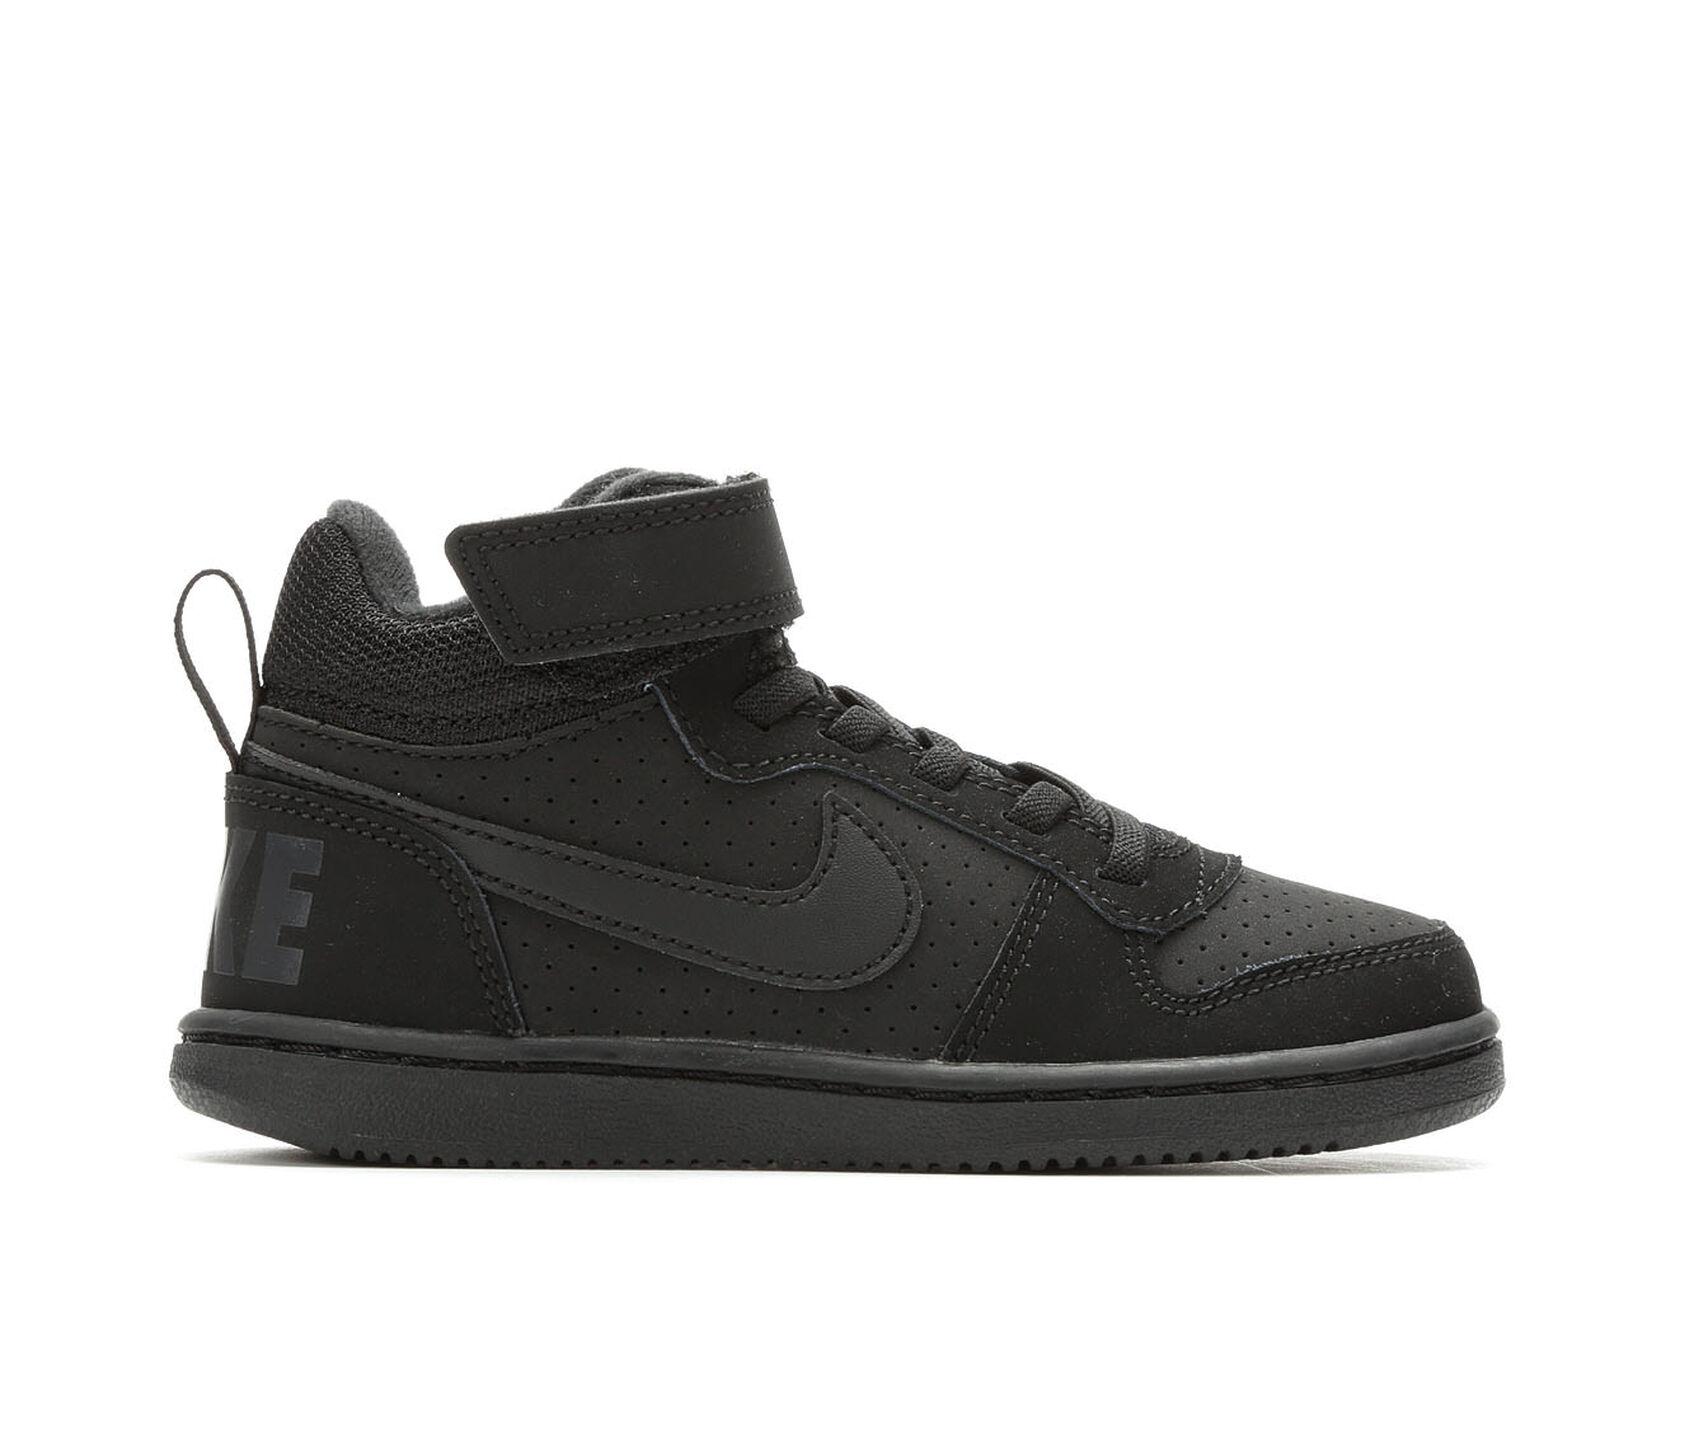 super popular e58b2 6872f ... Nike Little Kid Court Borough Mid Velcro High Top Basketball Shoes.  Previous